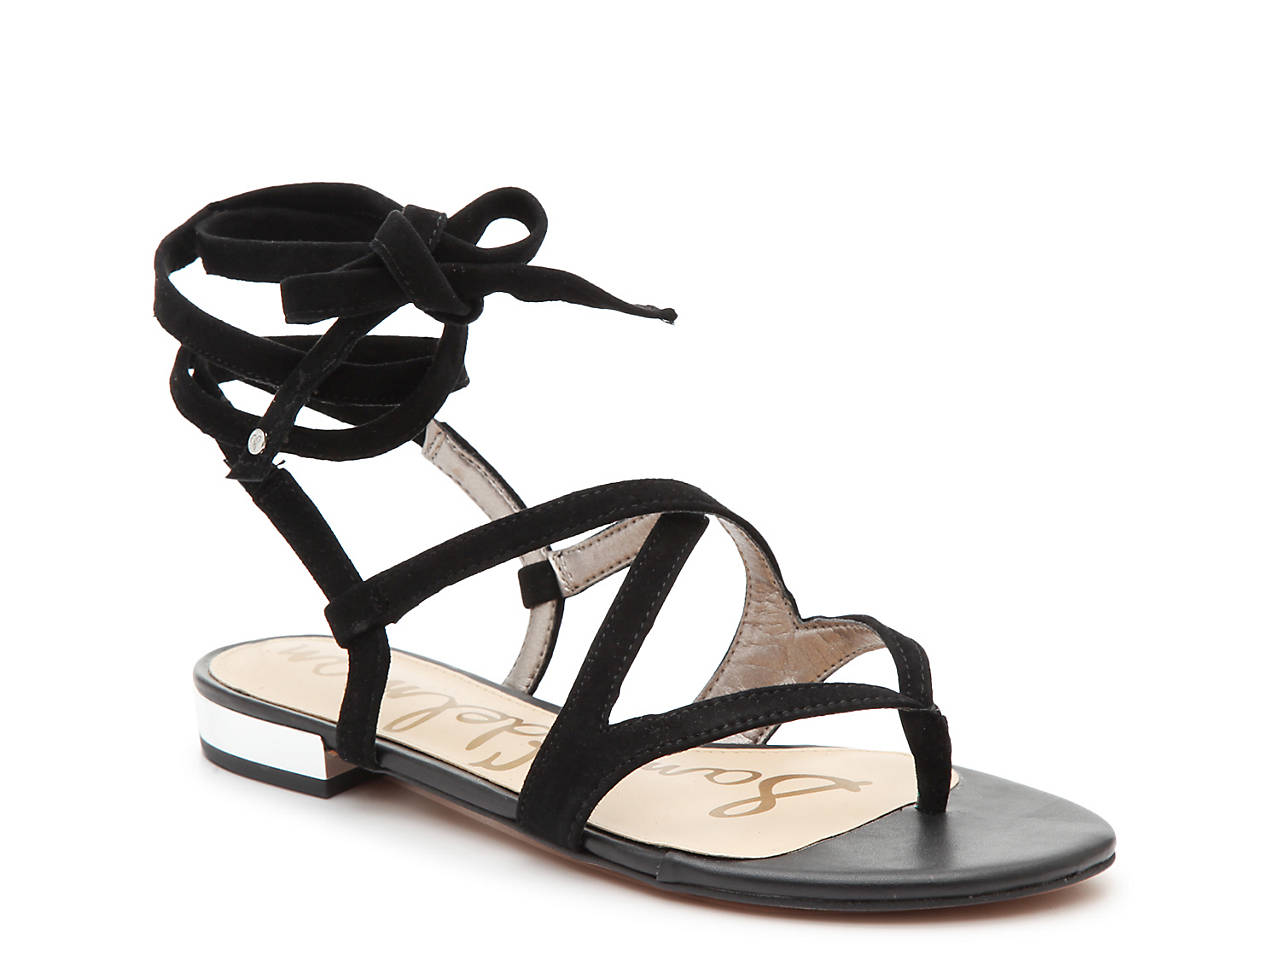 9f6e6f645 Sam Edelman Davina Sandal Women s Shoes